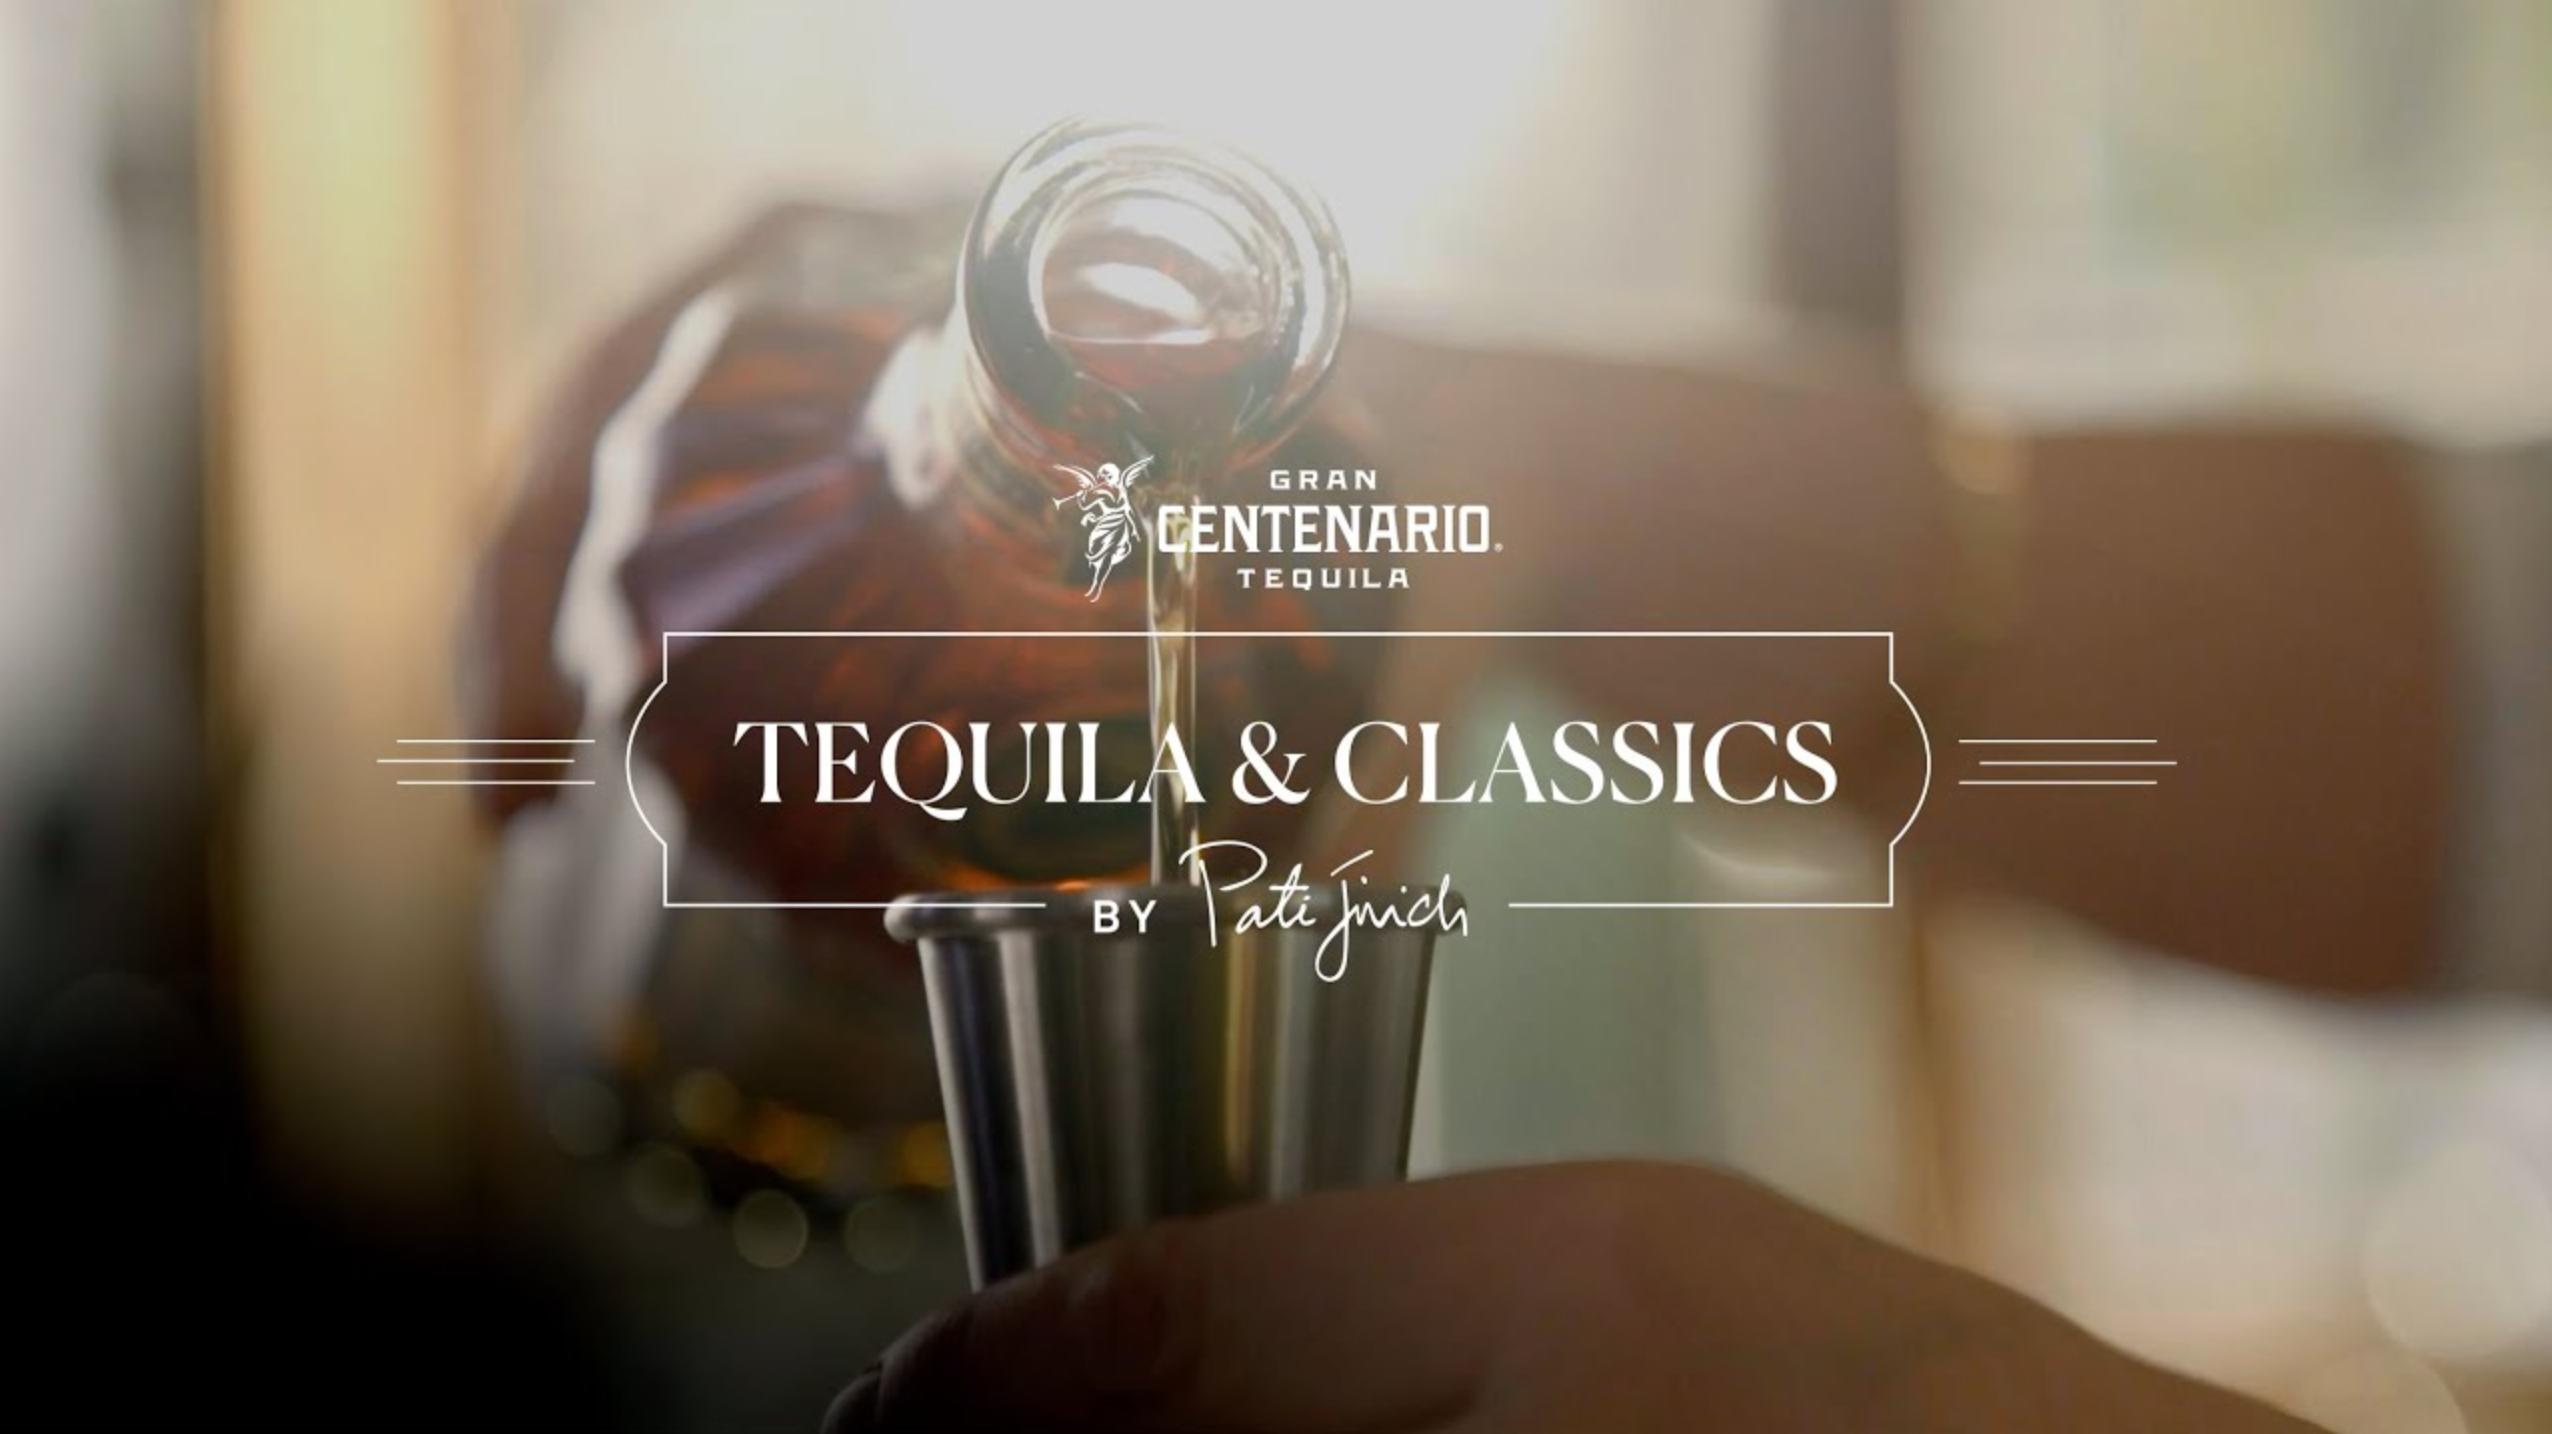 Tequila & Classics Episodio 1